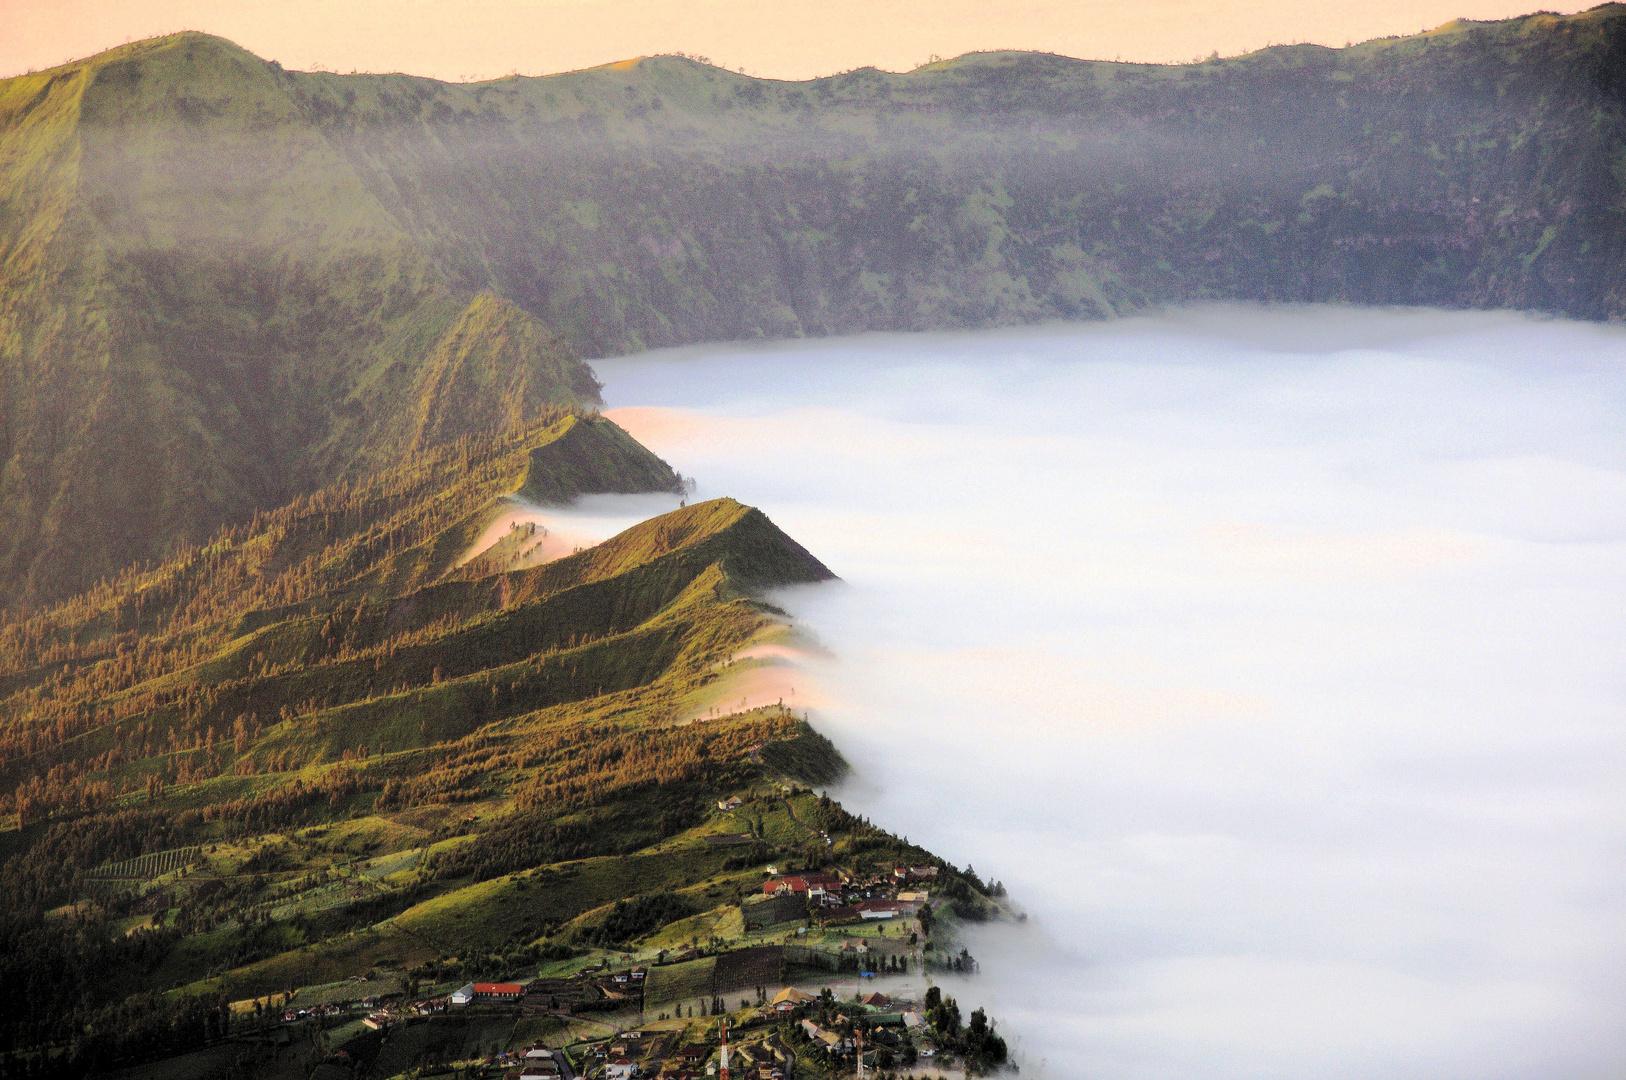 Morgennebel am Mt. Bromo Vulkan